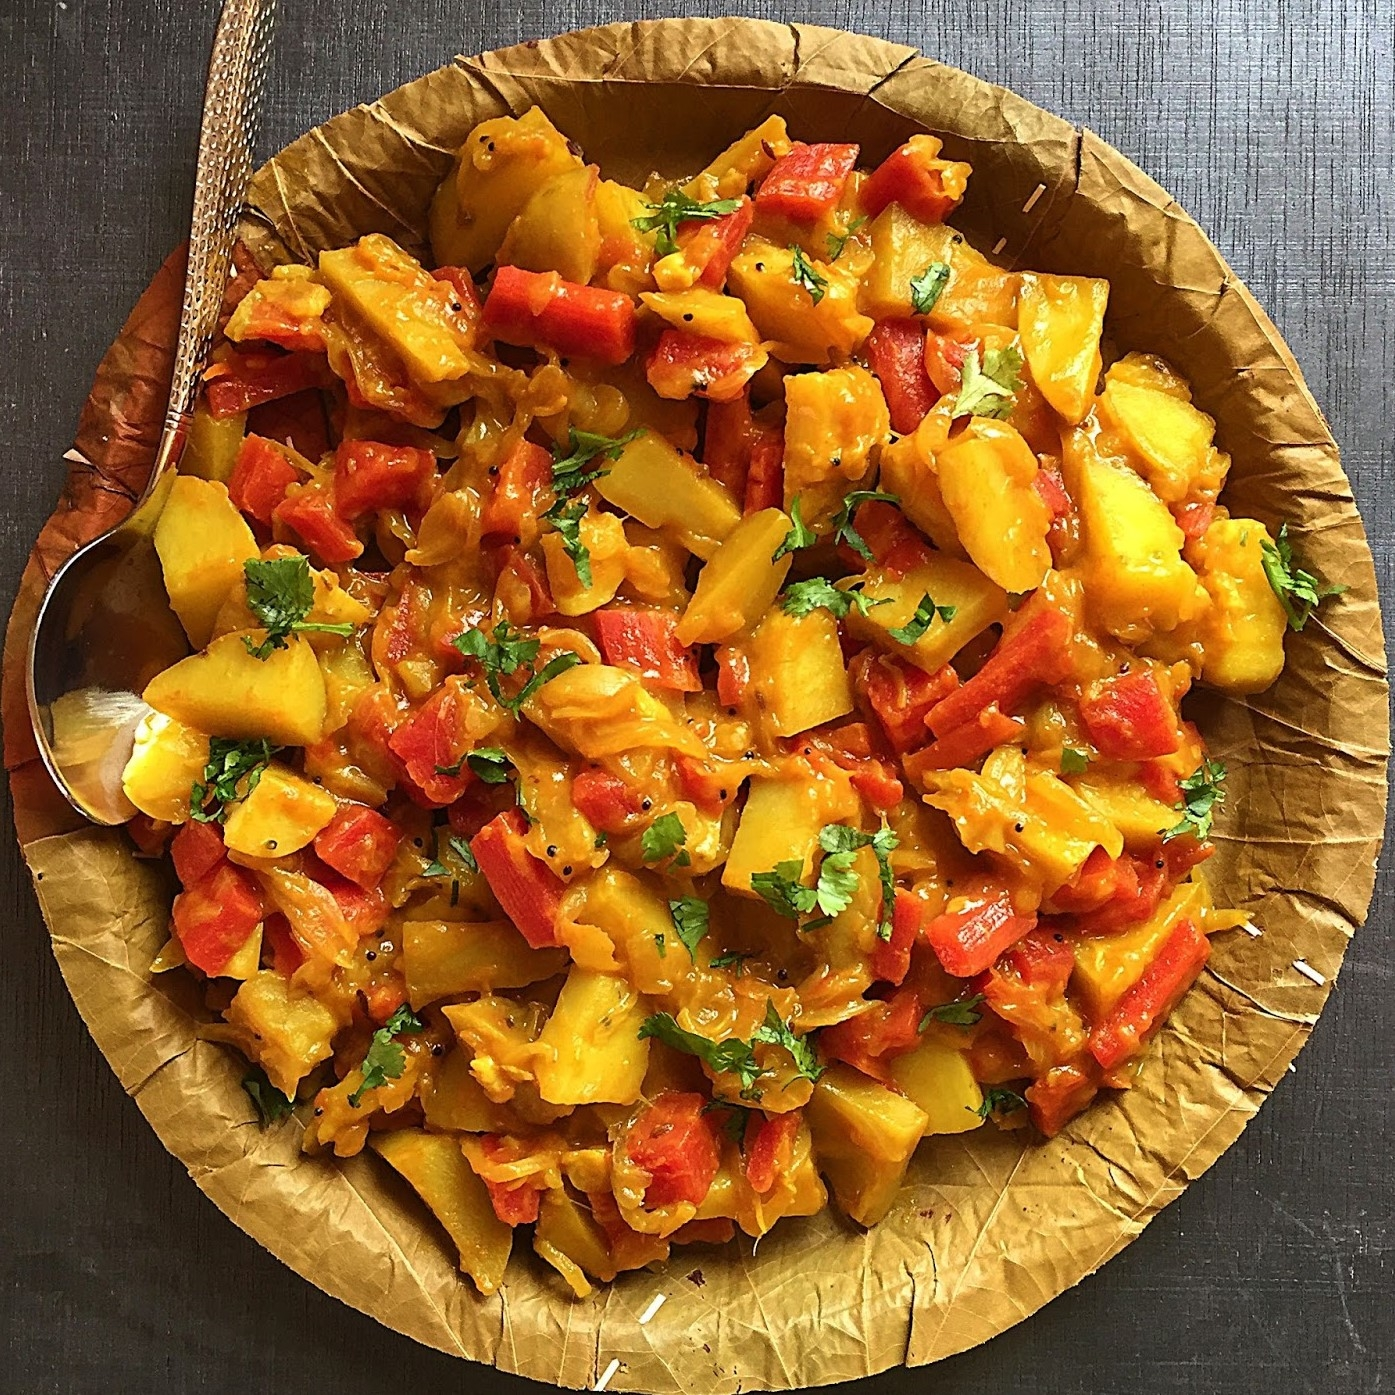 Алу Гаджар Сабджи - Картофельно-морковный карри